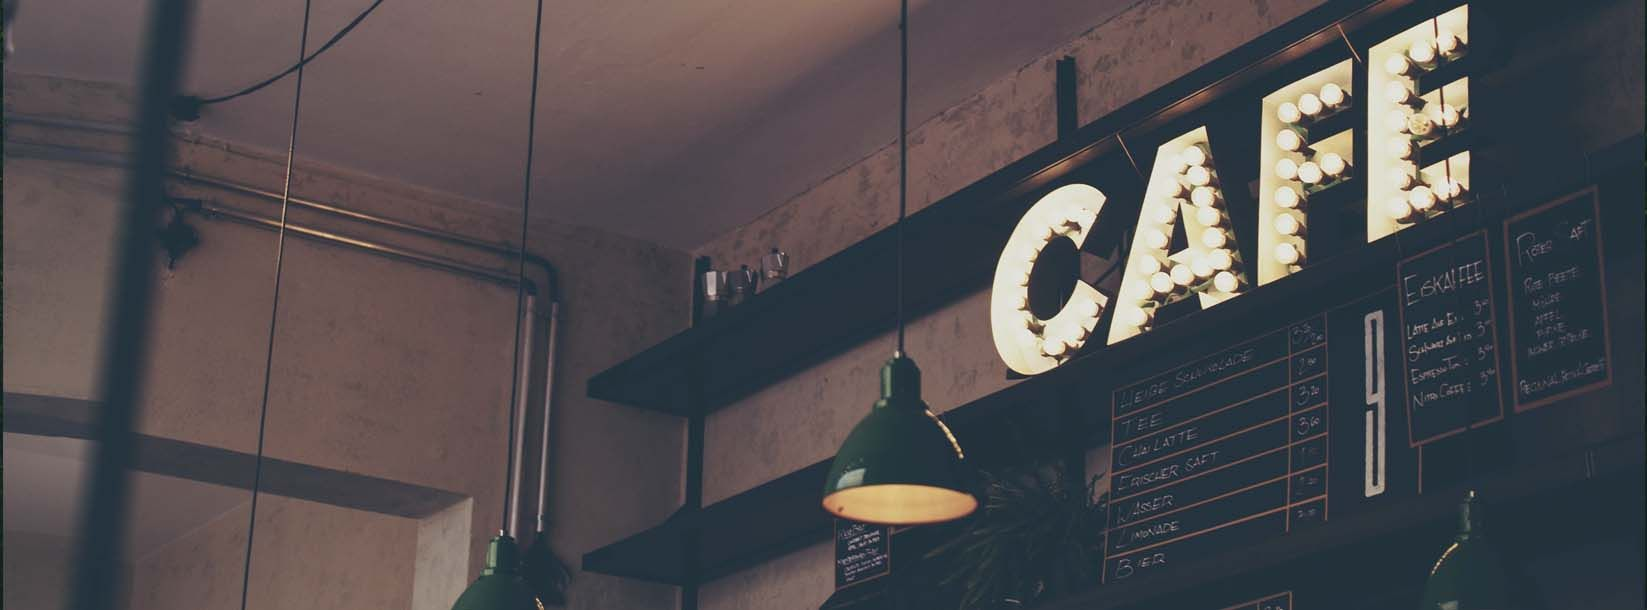 Interior design for restaurants, 100% concept